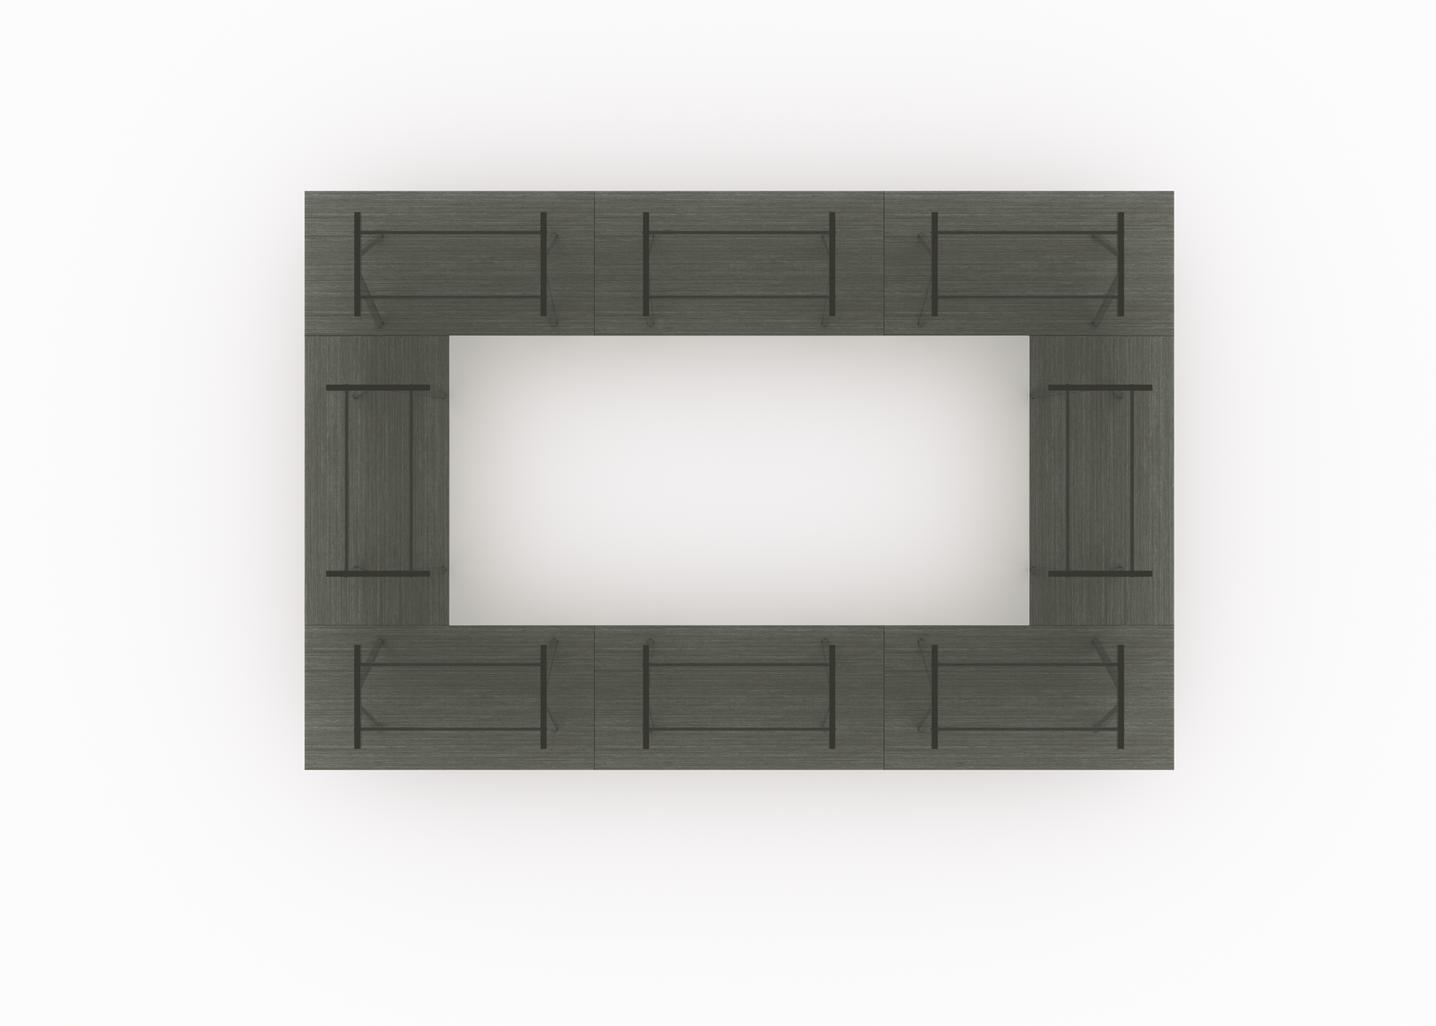 Cavalletto conf modular 2b.png